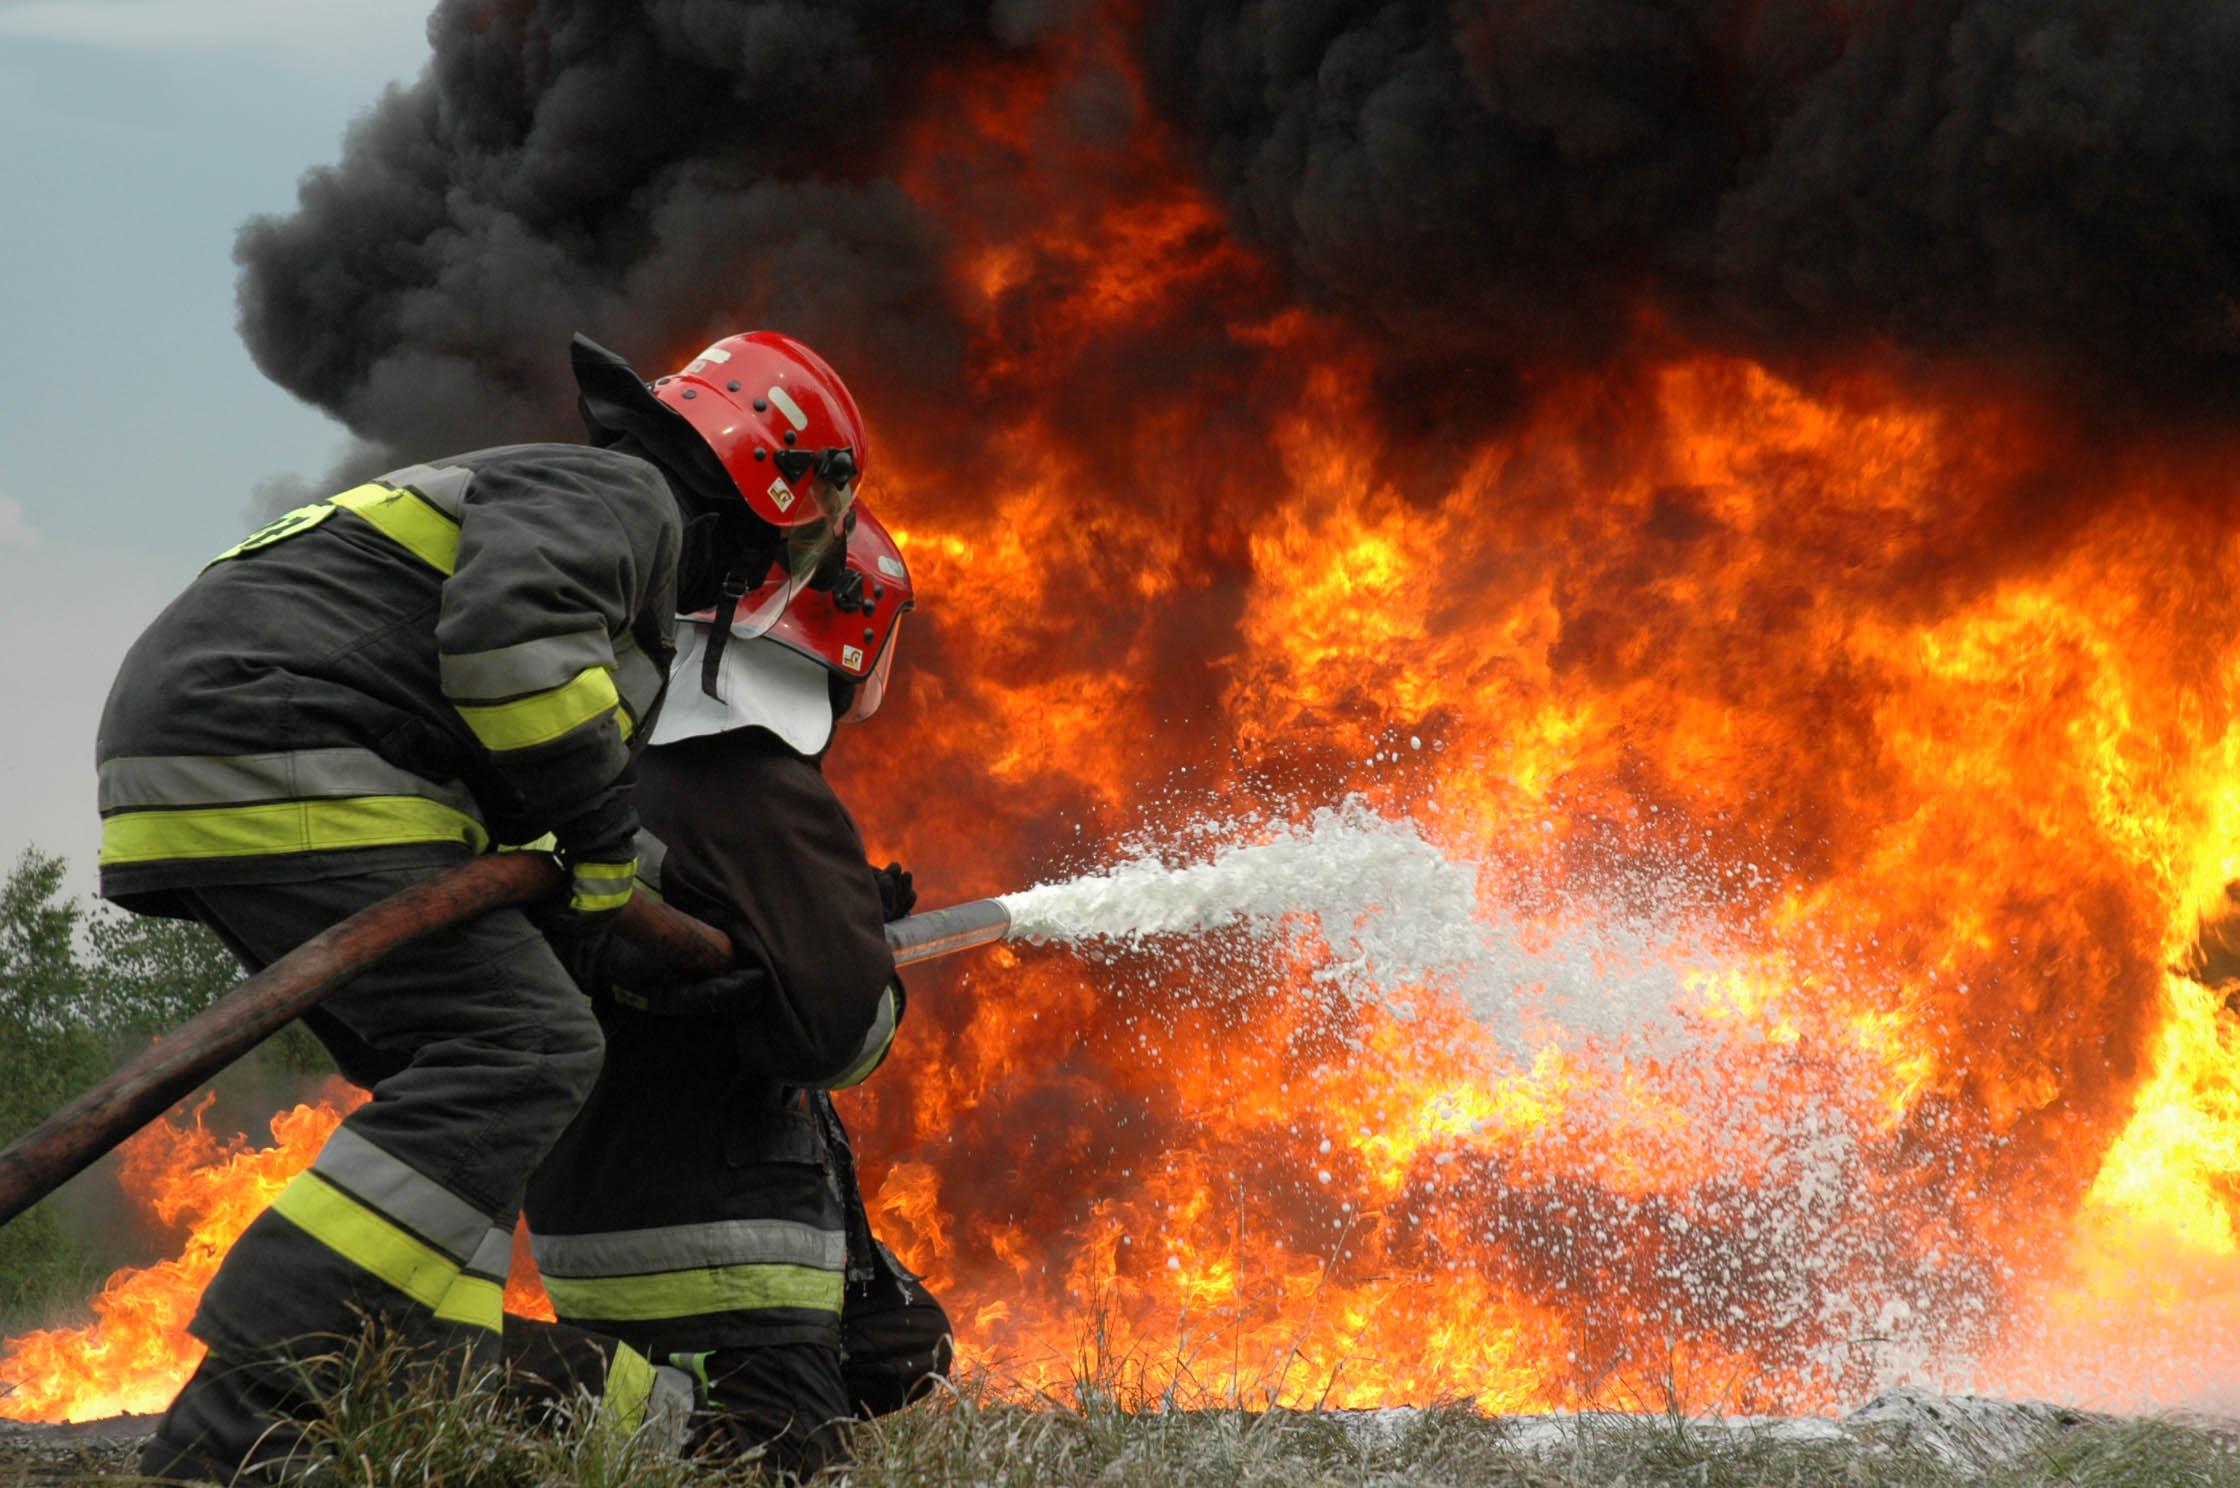 انبار تسمه خیابان سعدی در آتش سوخت